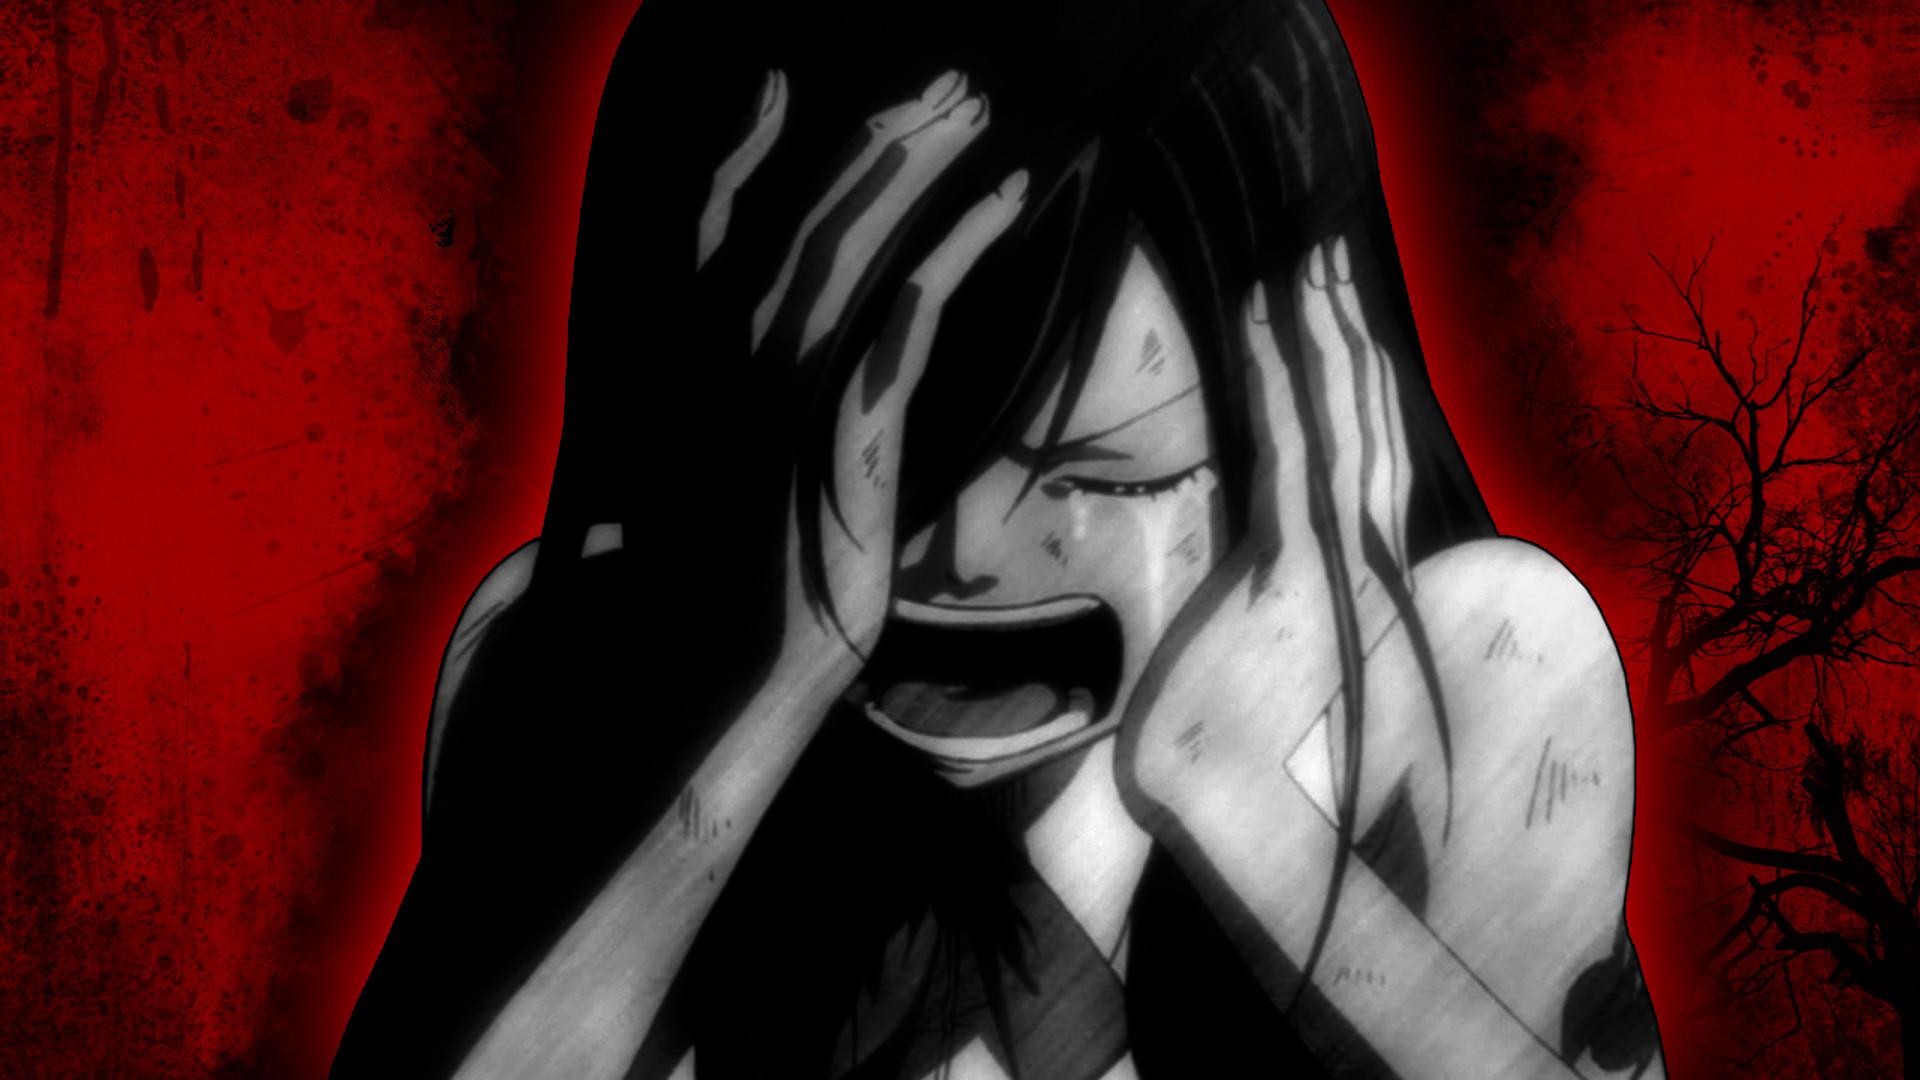 Anime – Fairy Tail Erza Scarlet Blood Sad Far Cry Wallpaper